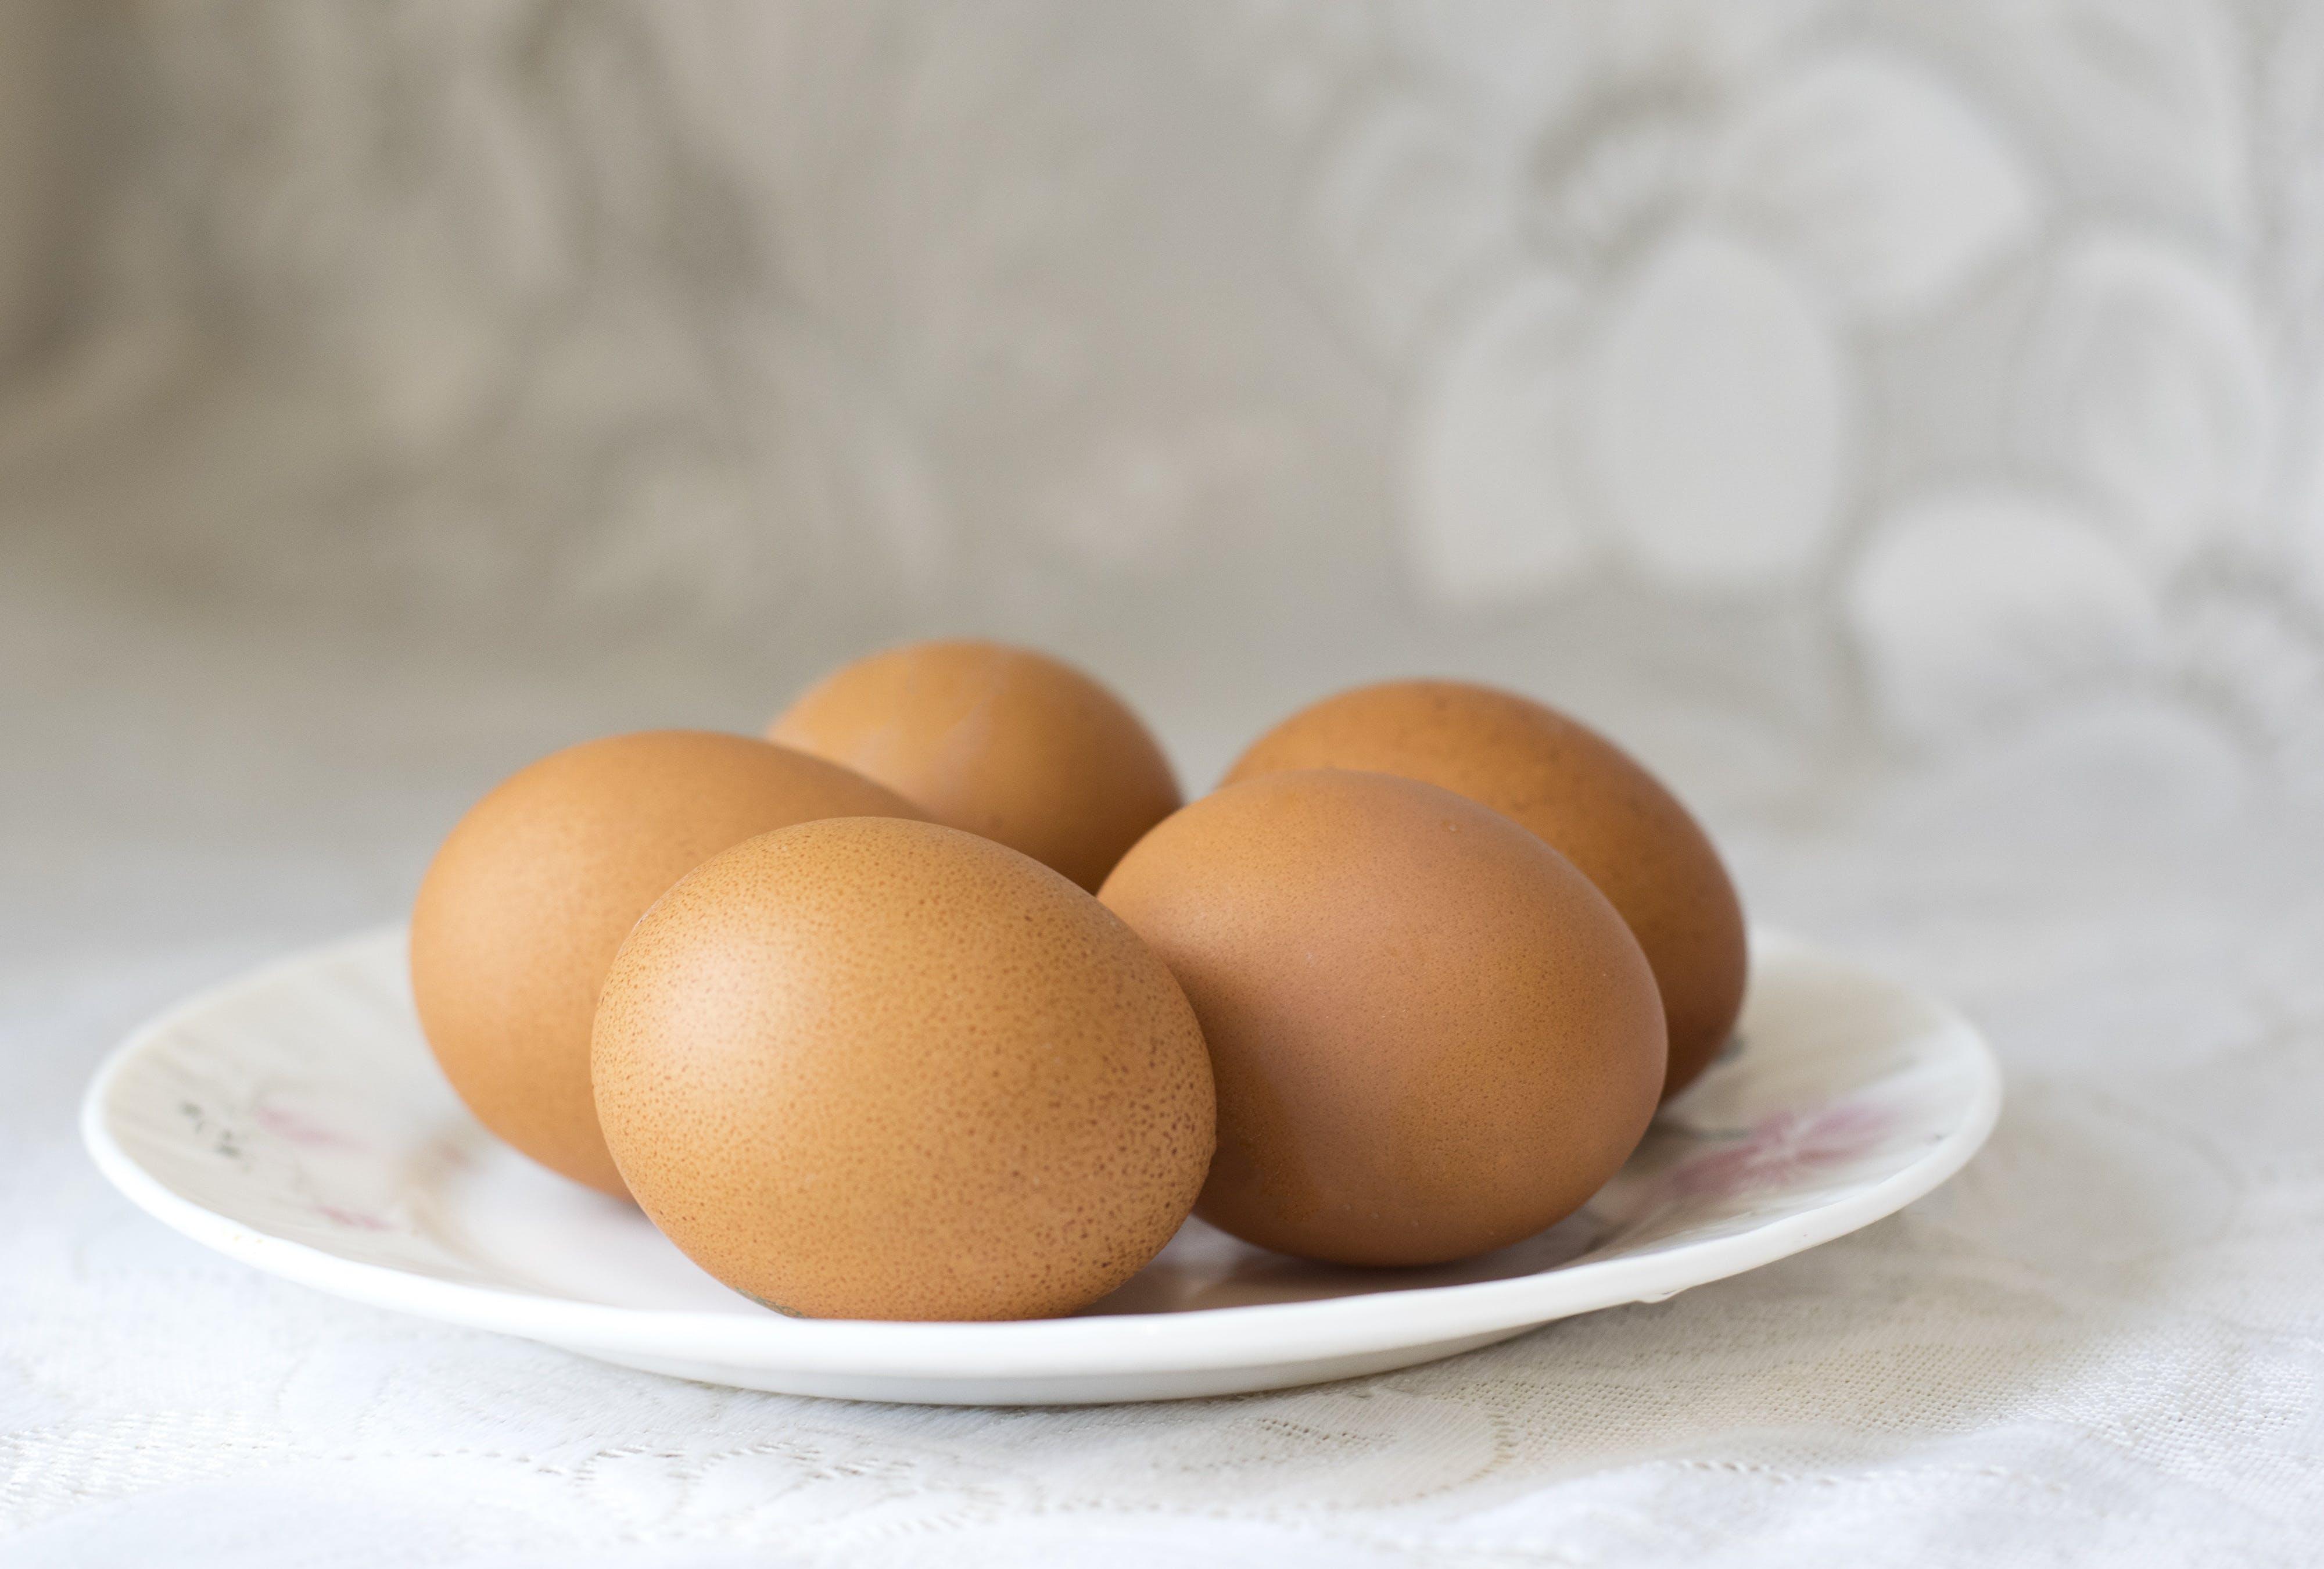 Five Organic Eggs on Plate